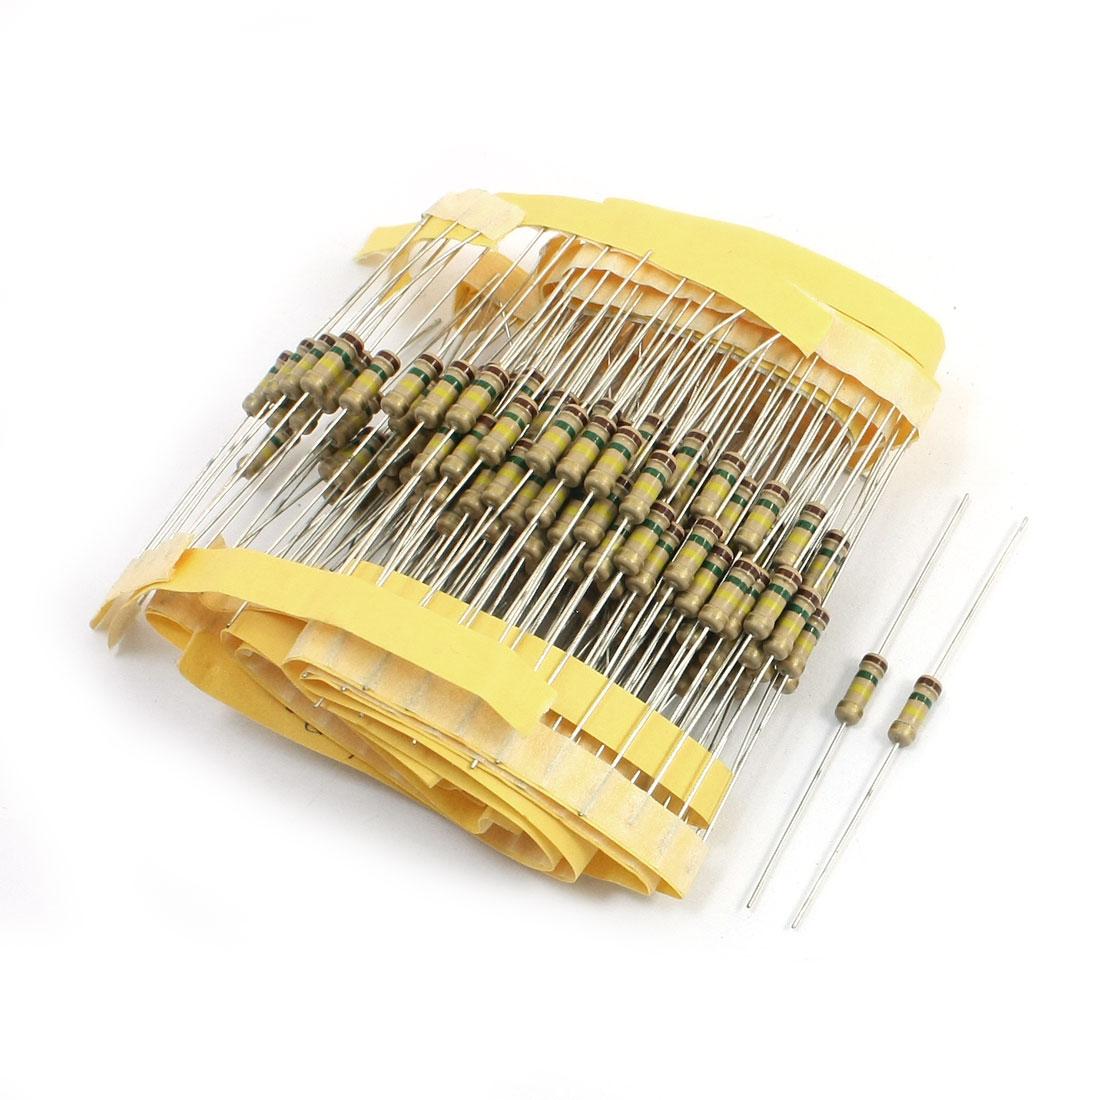 200 Pcs 150K Ohm 0.5Watt 5% Tolerance Axial Lead Type Through Hole Mounting Carbon Film Fixed Resistors